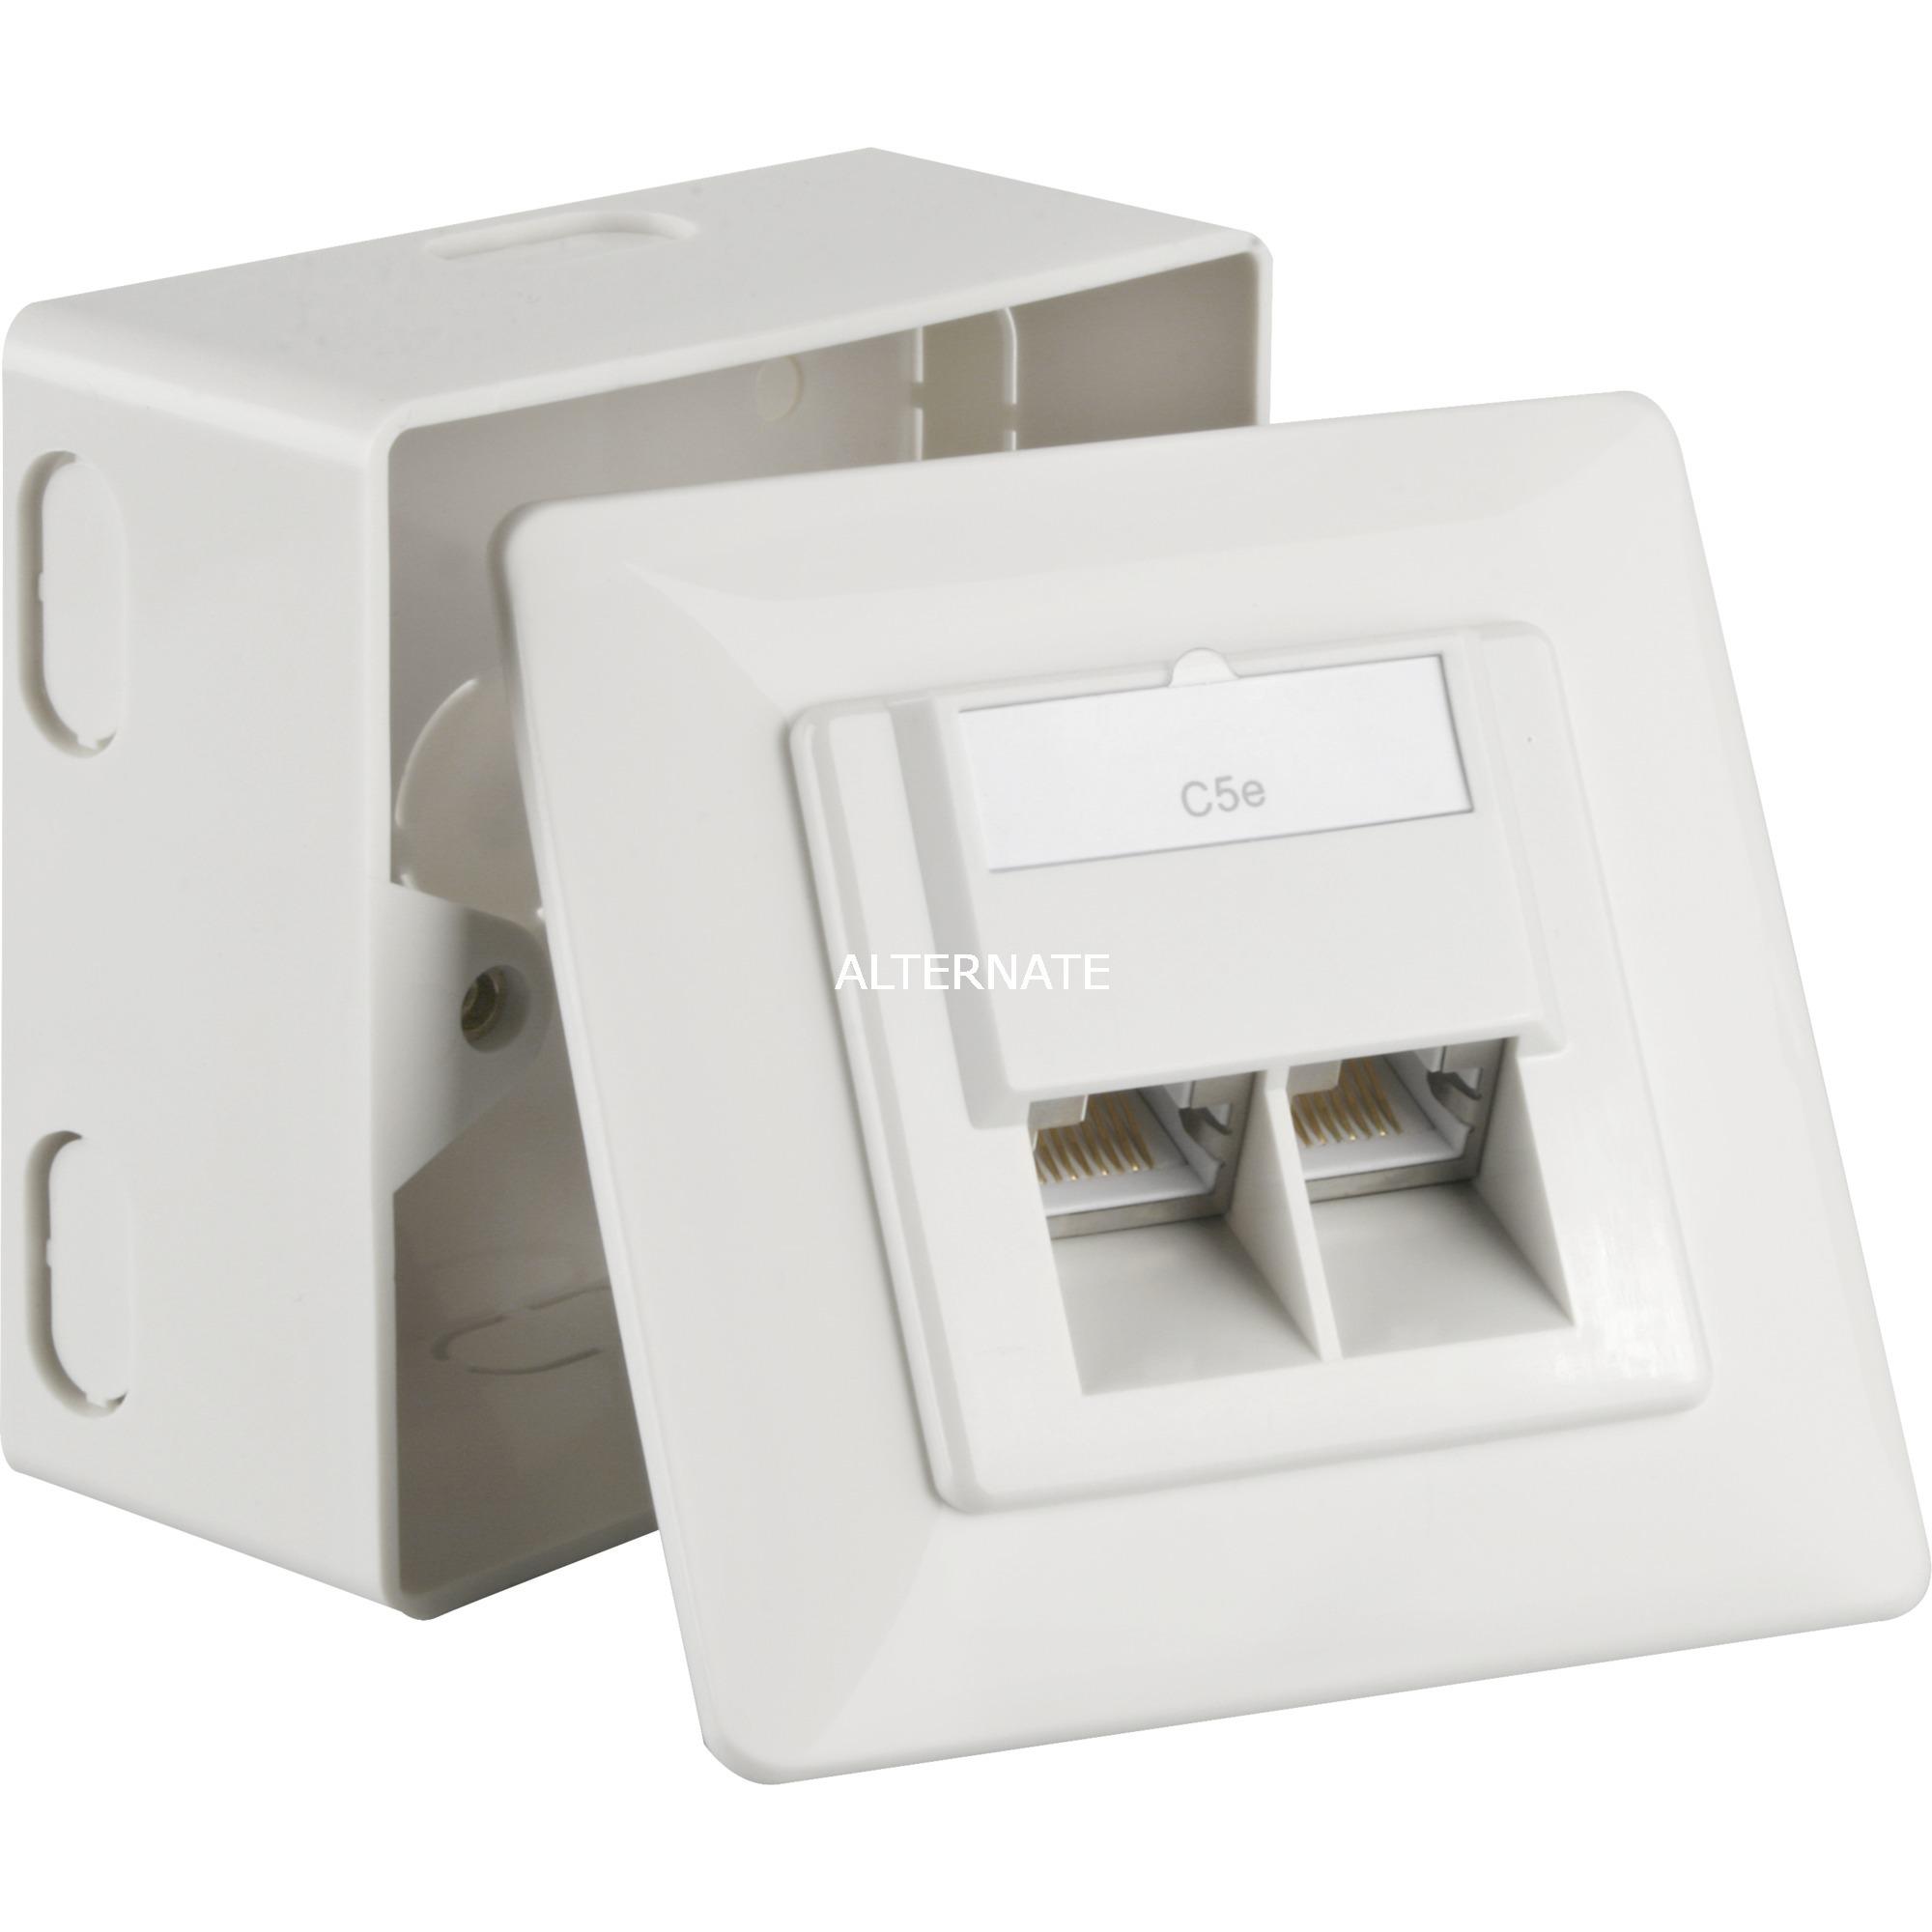 50943 Blanco soporte de pared para pantalla plana, Caja